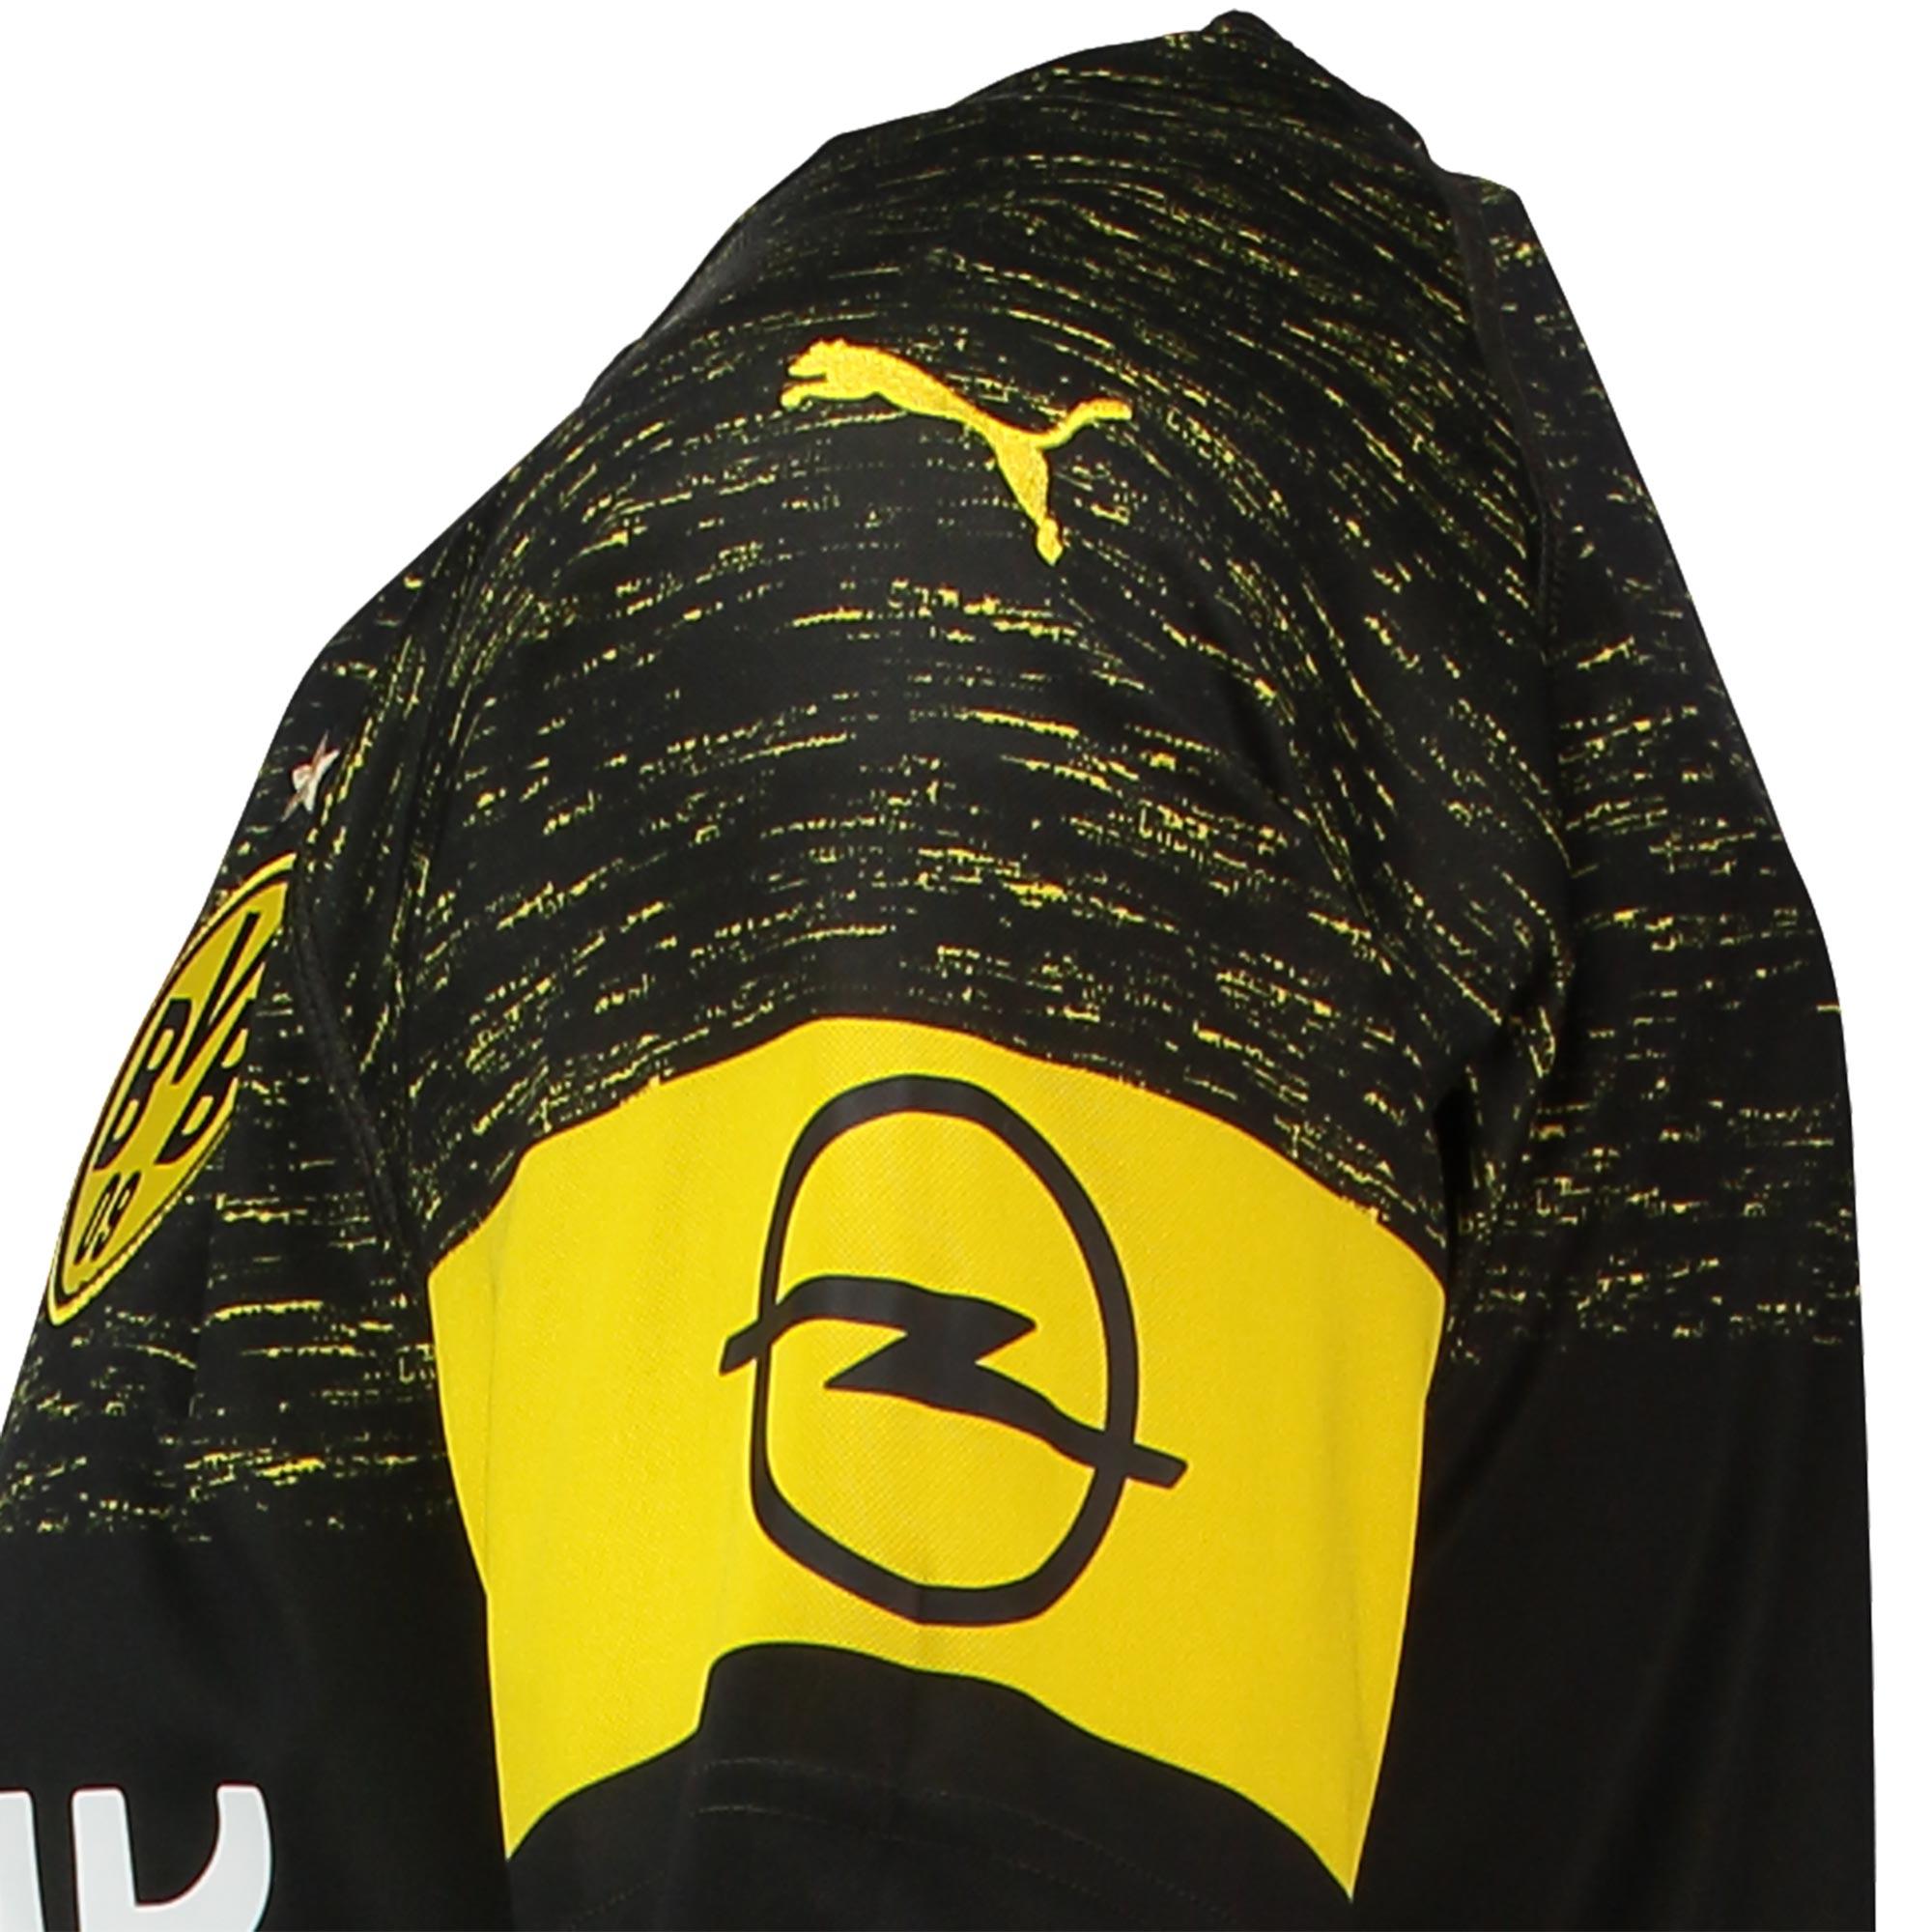 Borussia Dortmund Have Revealed Their 2018/19 Away Kit by Puma